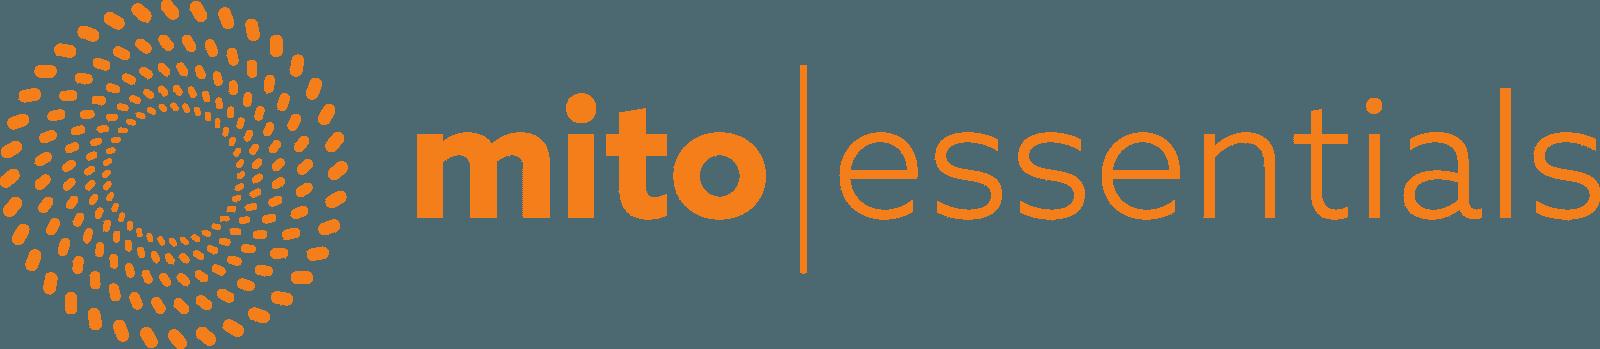 mito essentials logo